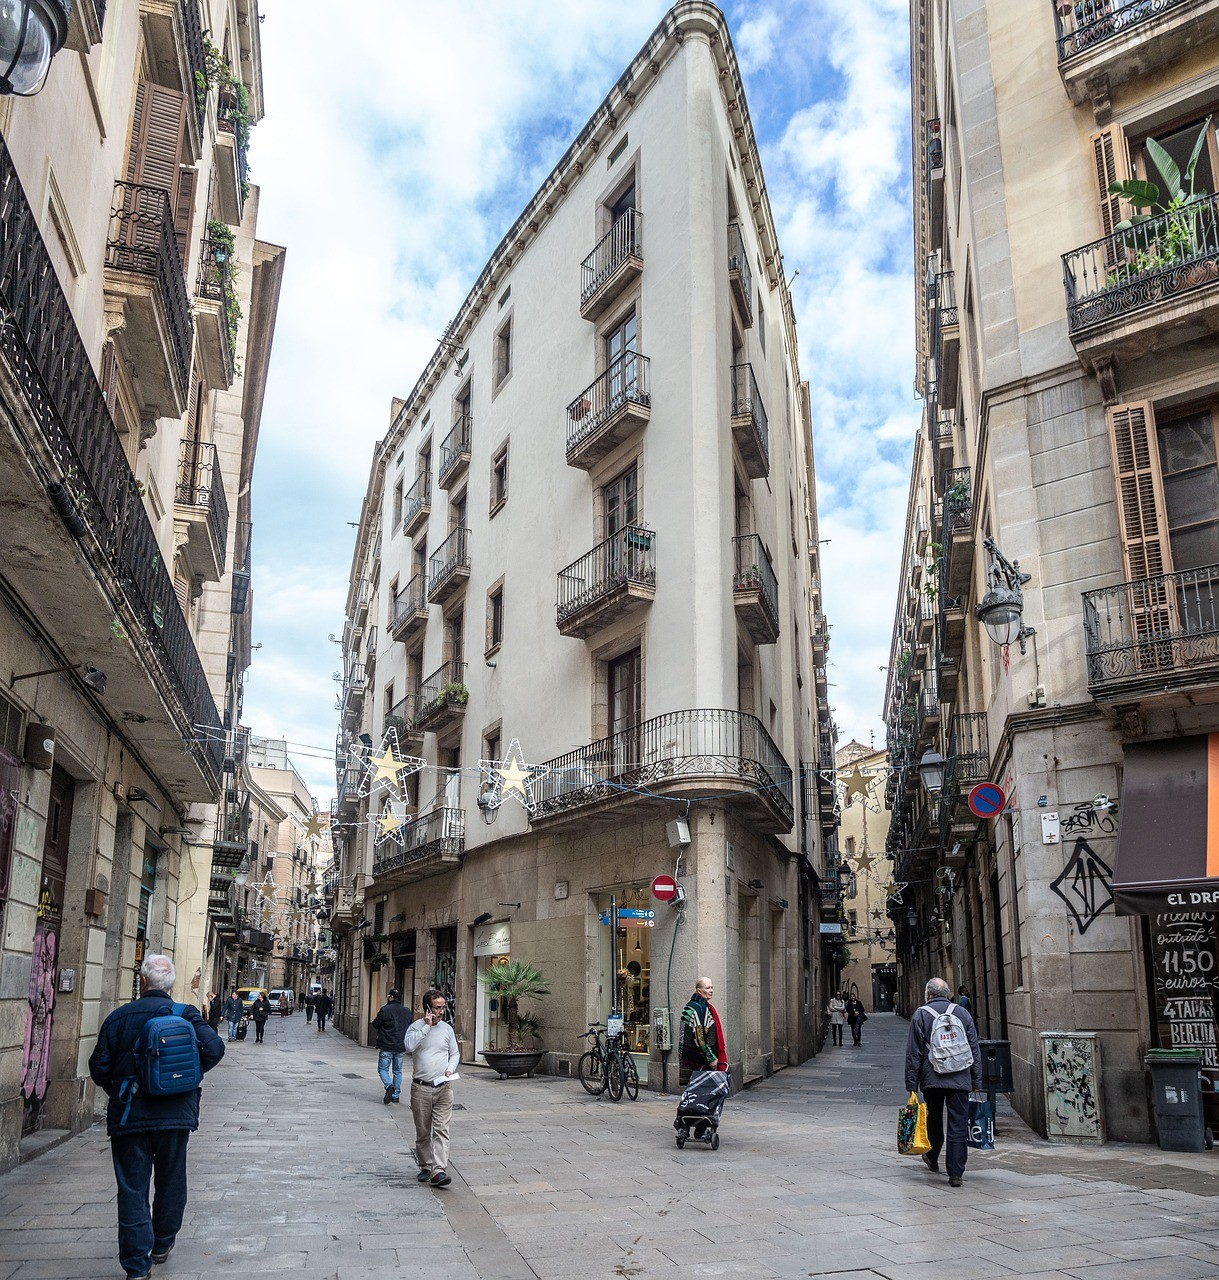 Las 5 Ciudades Mas Peligrosas De España